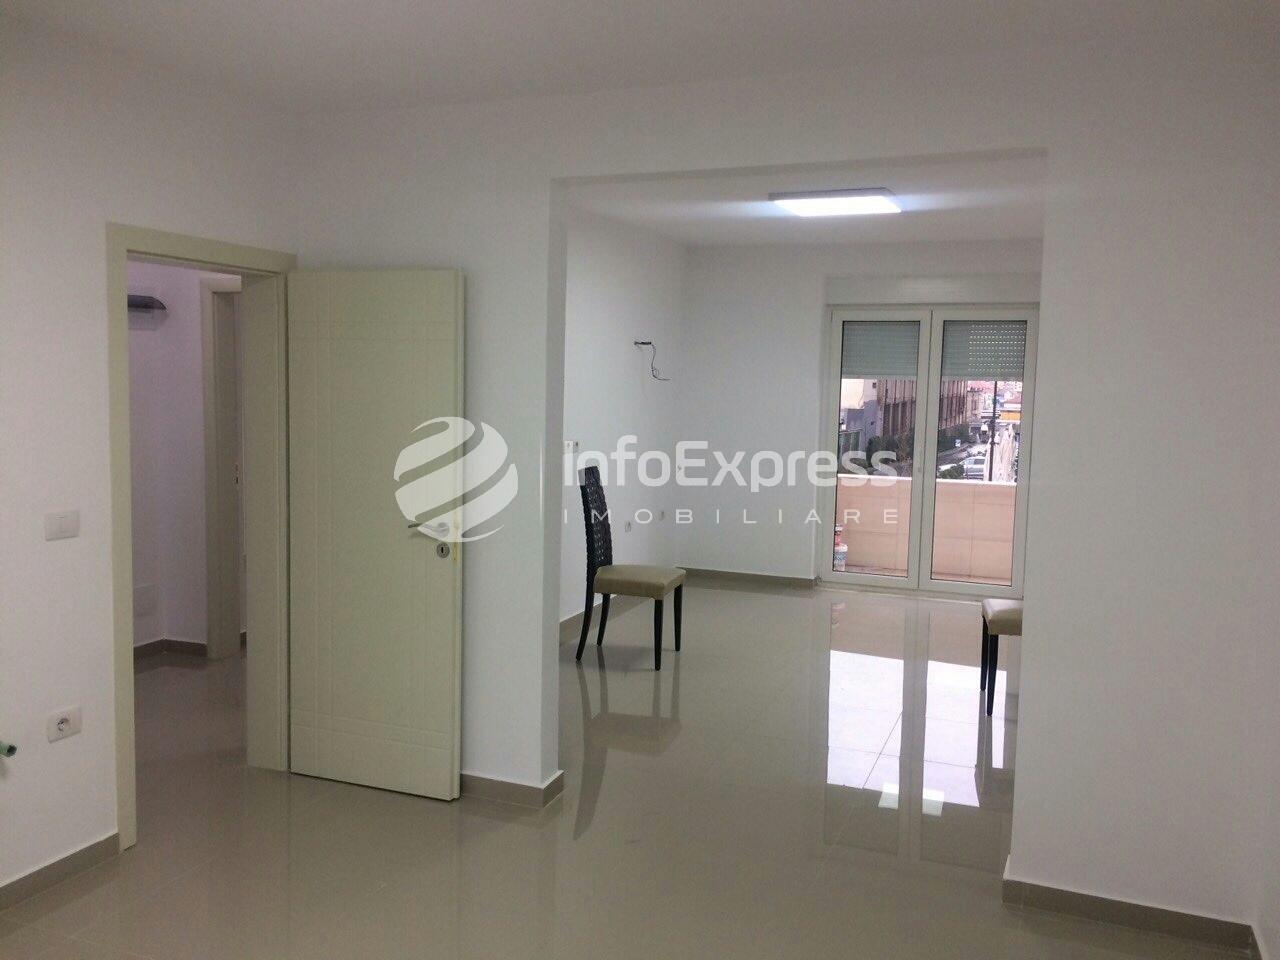 TRR-317-634  Apartament 80 m2 (2+1) me qera per zyra te Zogu i Zi.